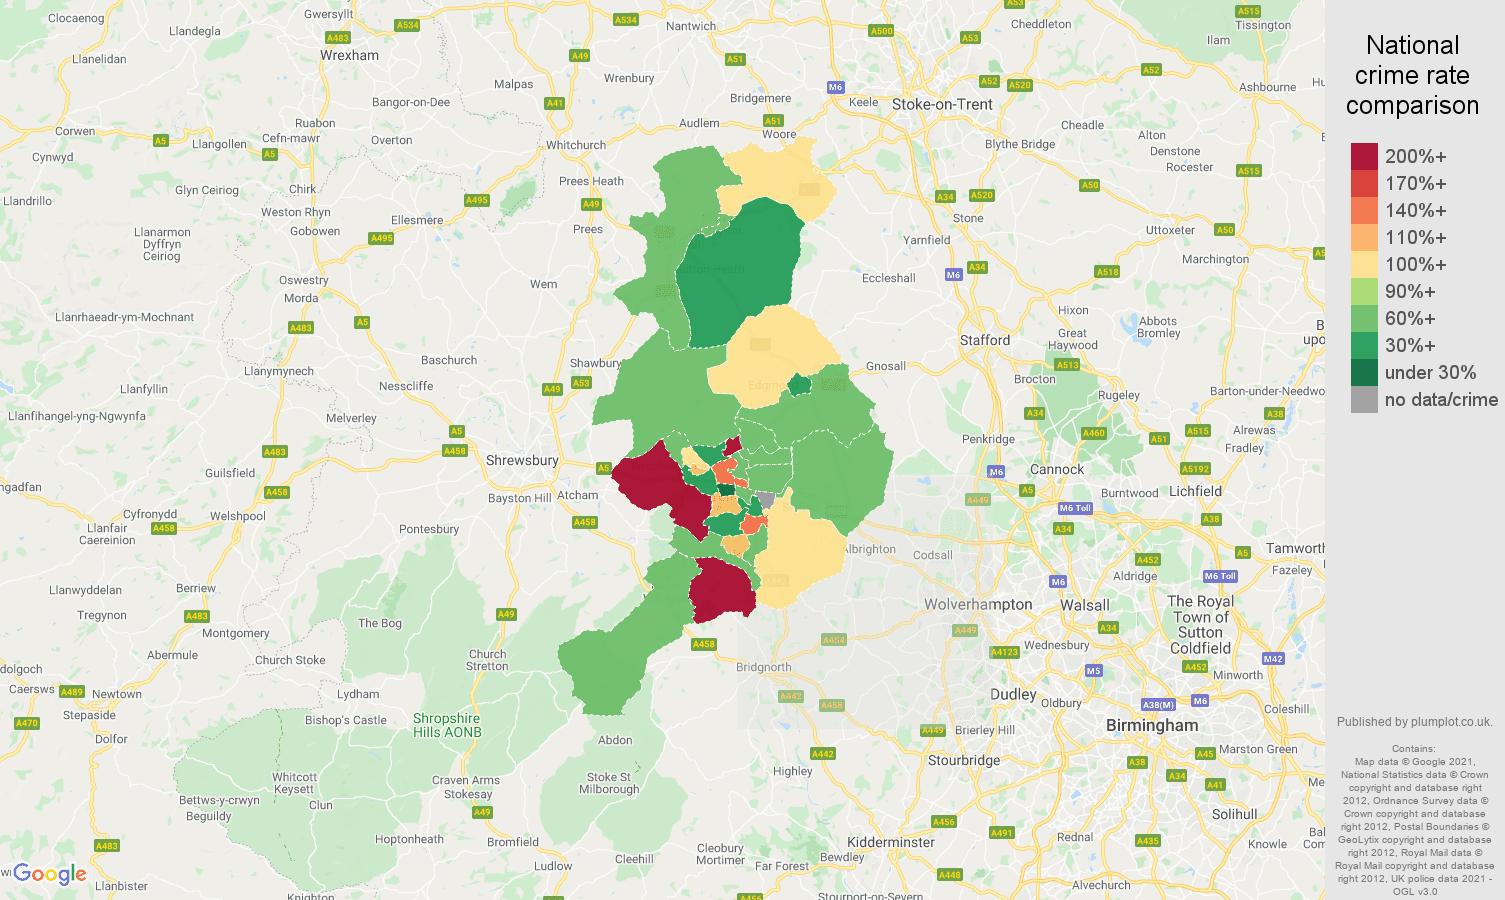 Telford burglary crime rate comparison map